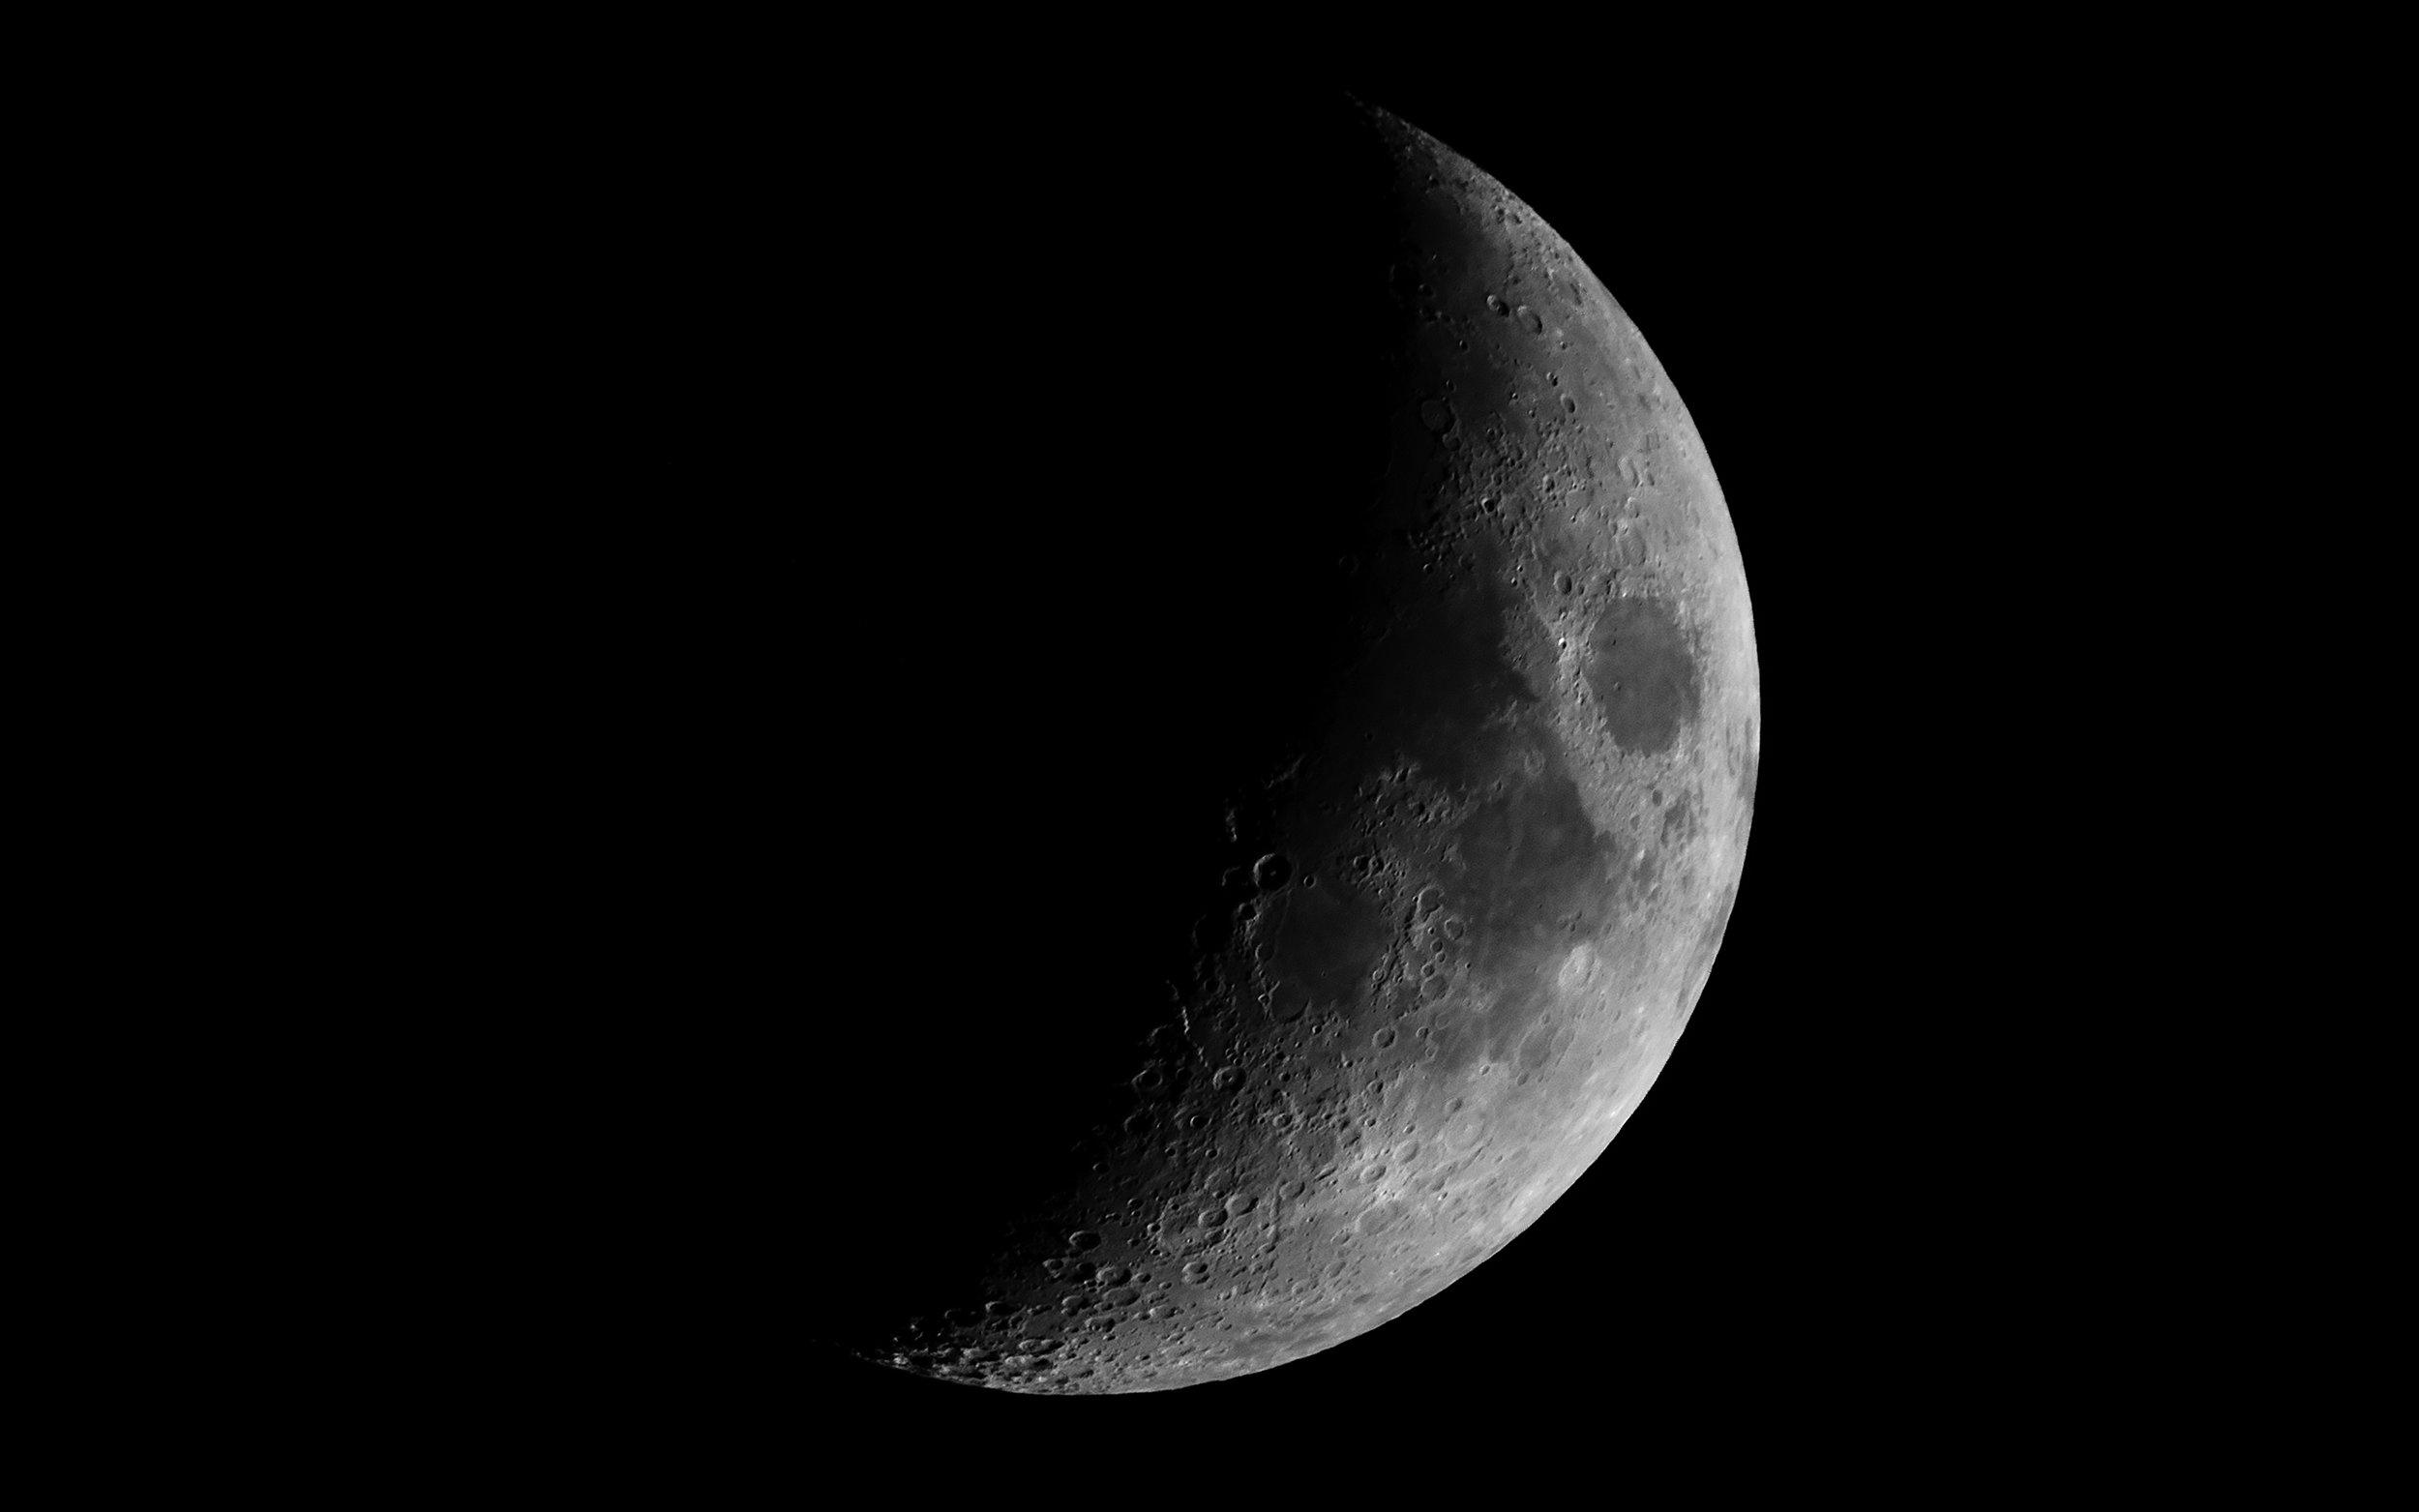 Waxing Crescent Moon - 27% Illuminated 5 days old